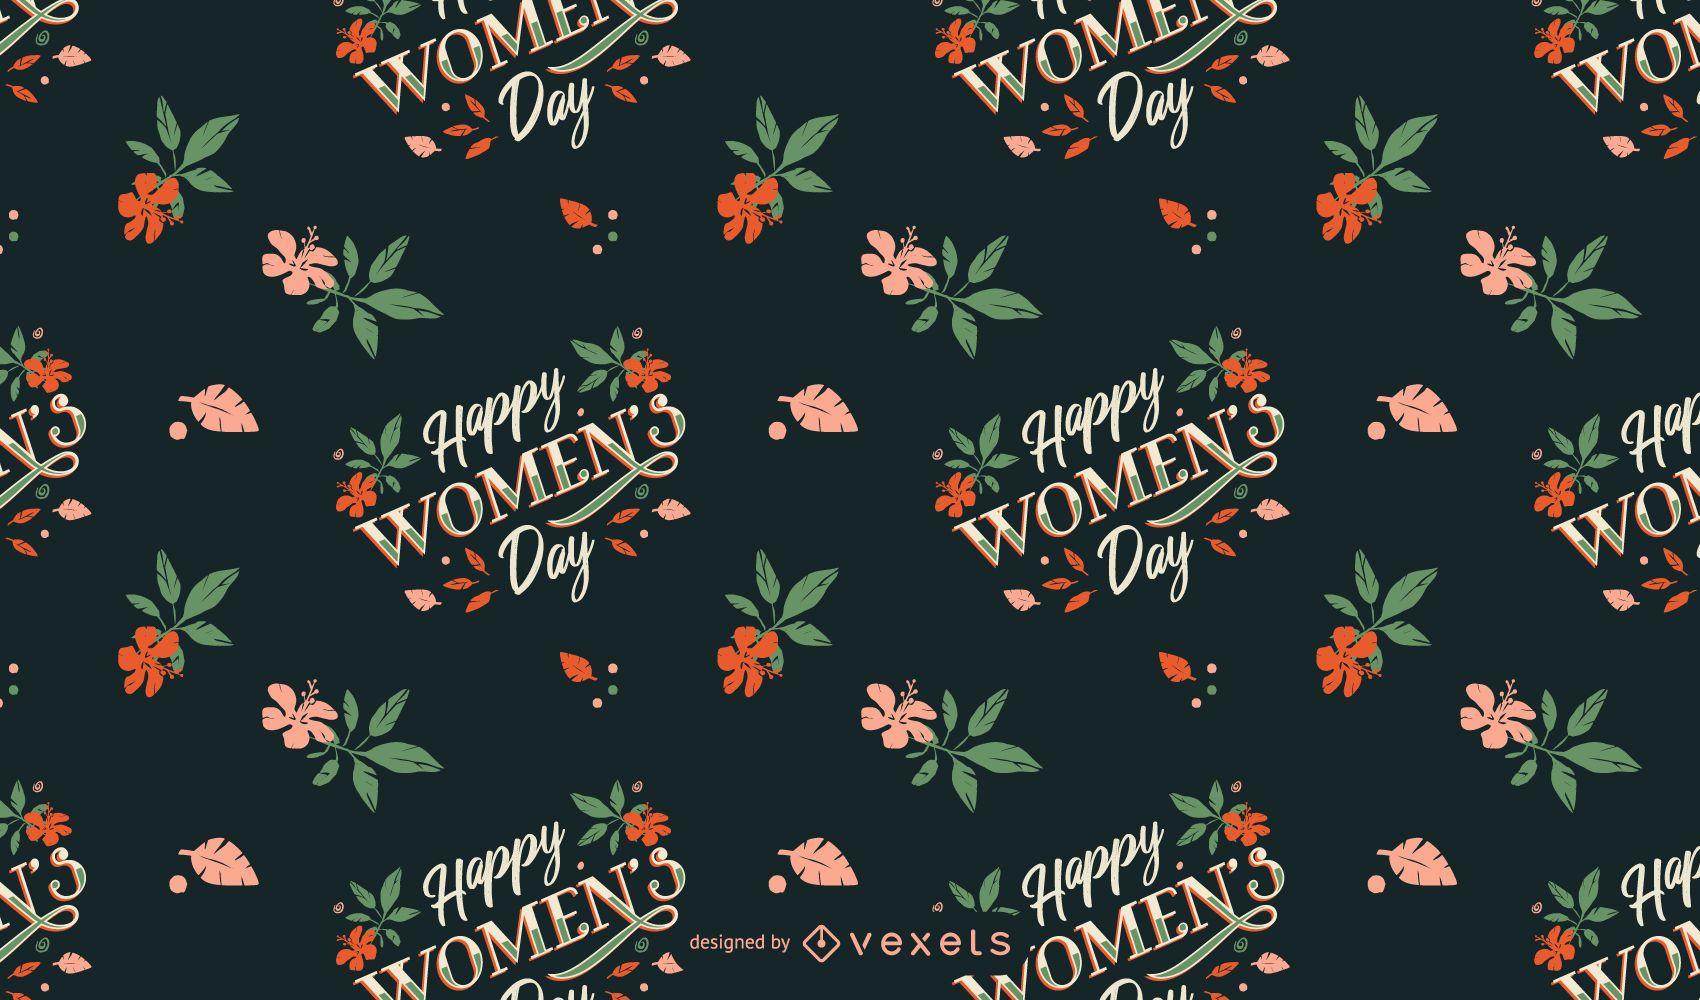 Happy Womens day pattern design